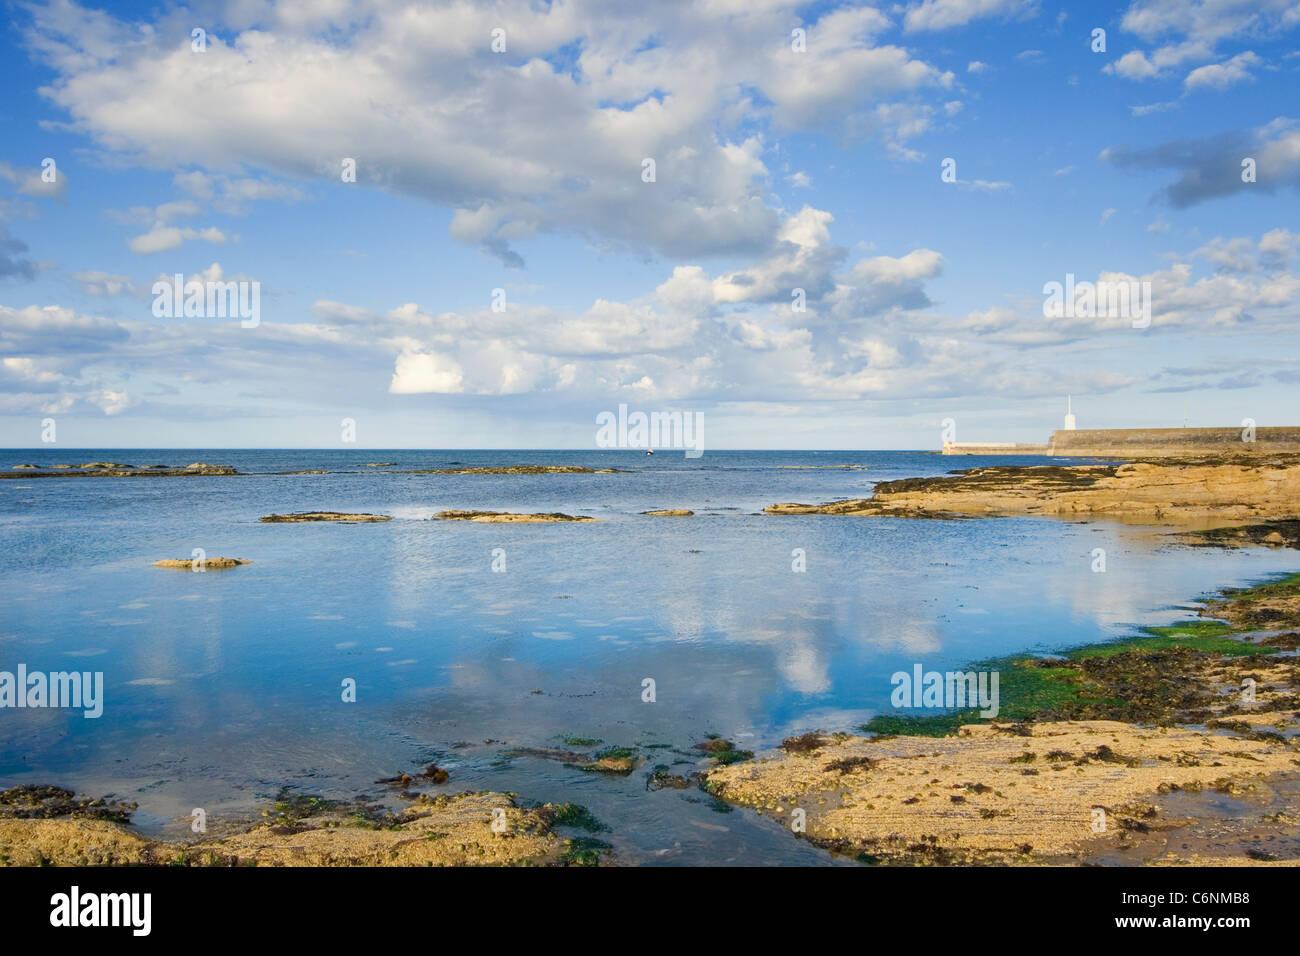 Seahouses, Northumberland, England. Seascape. - Stock Image